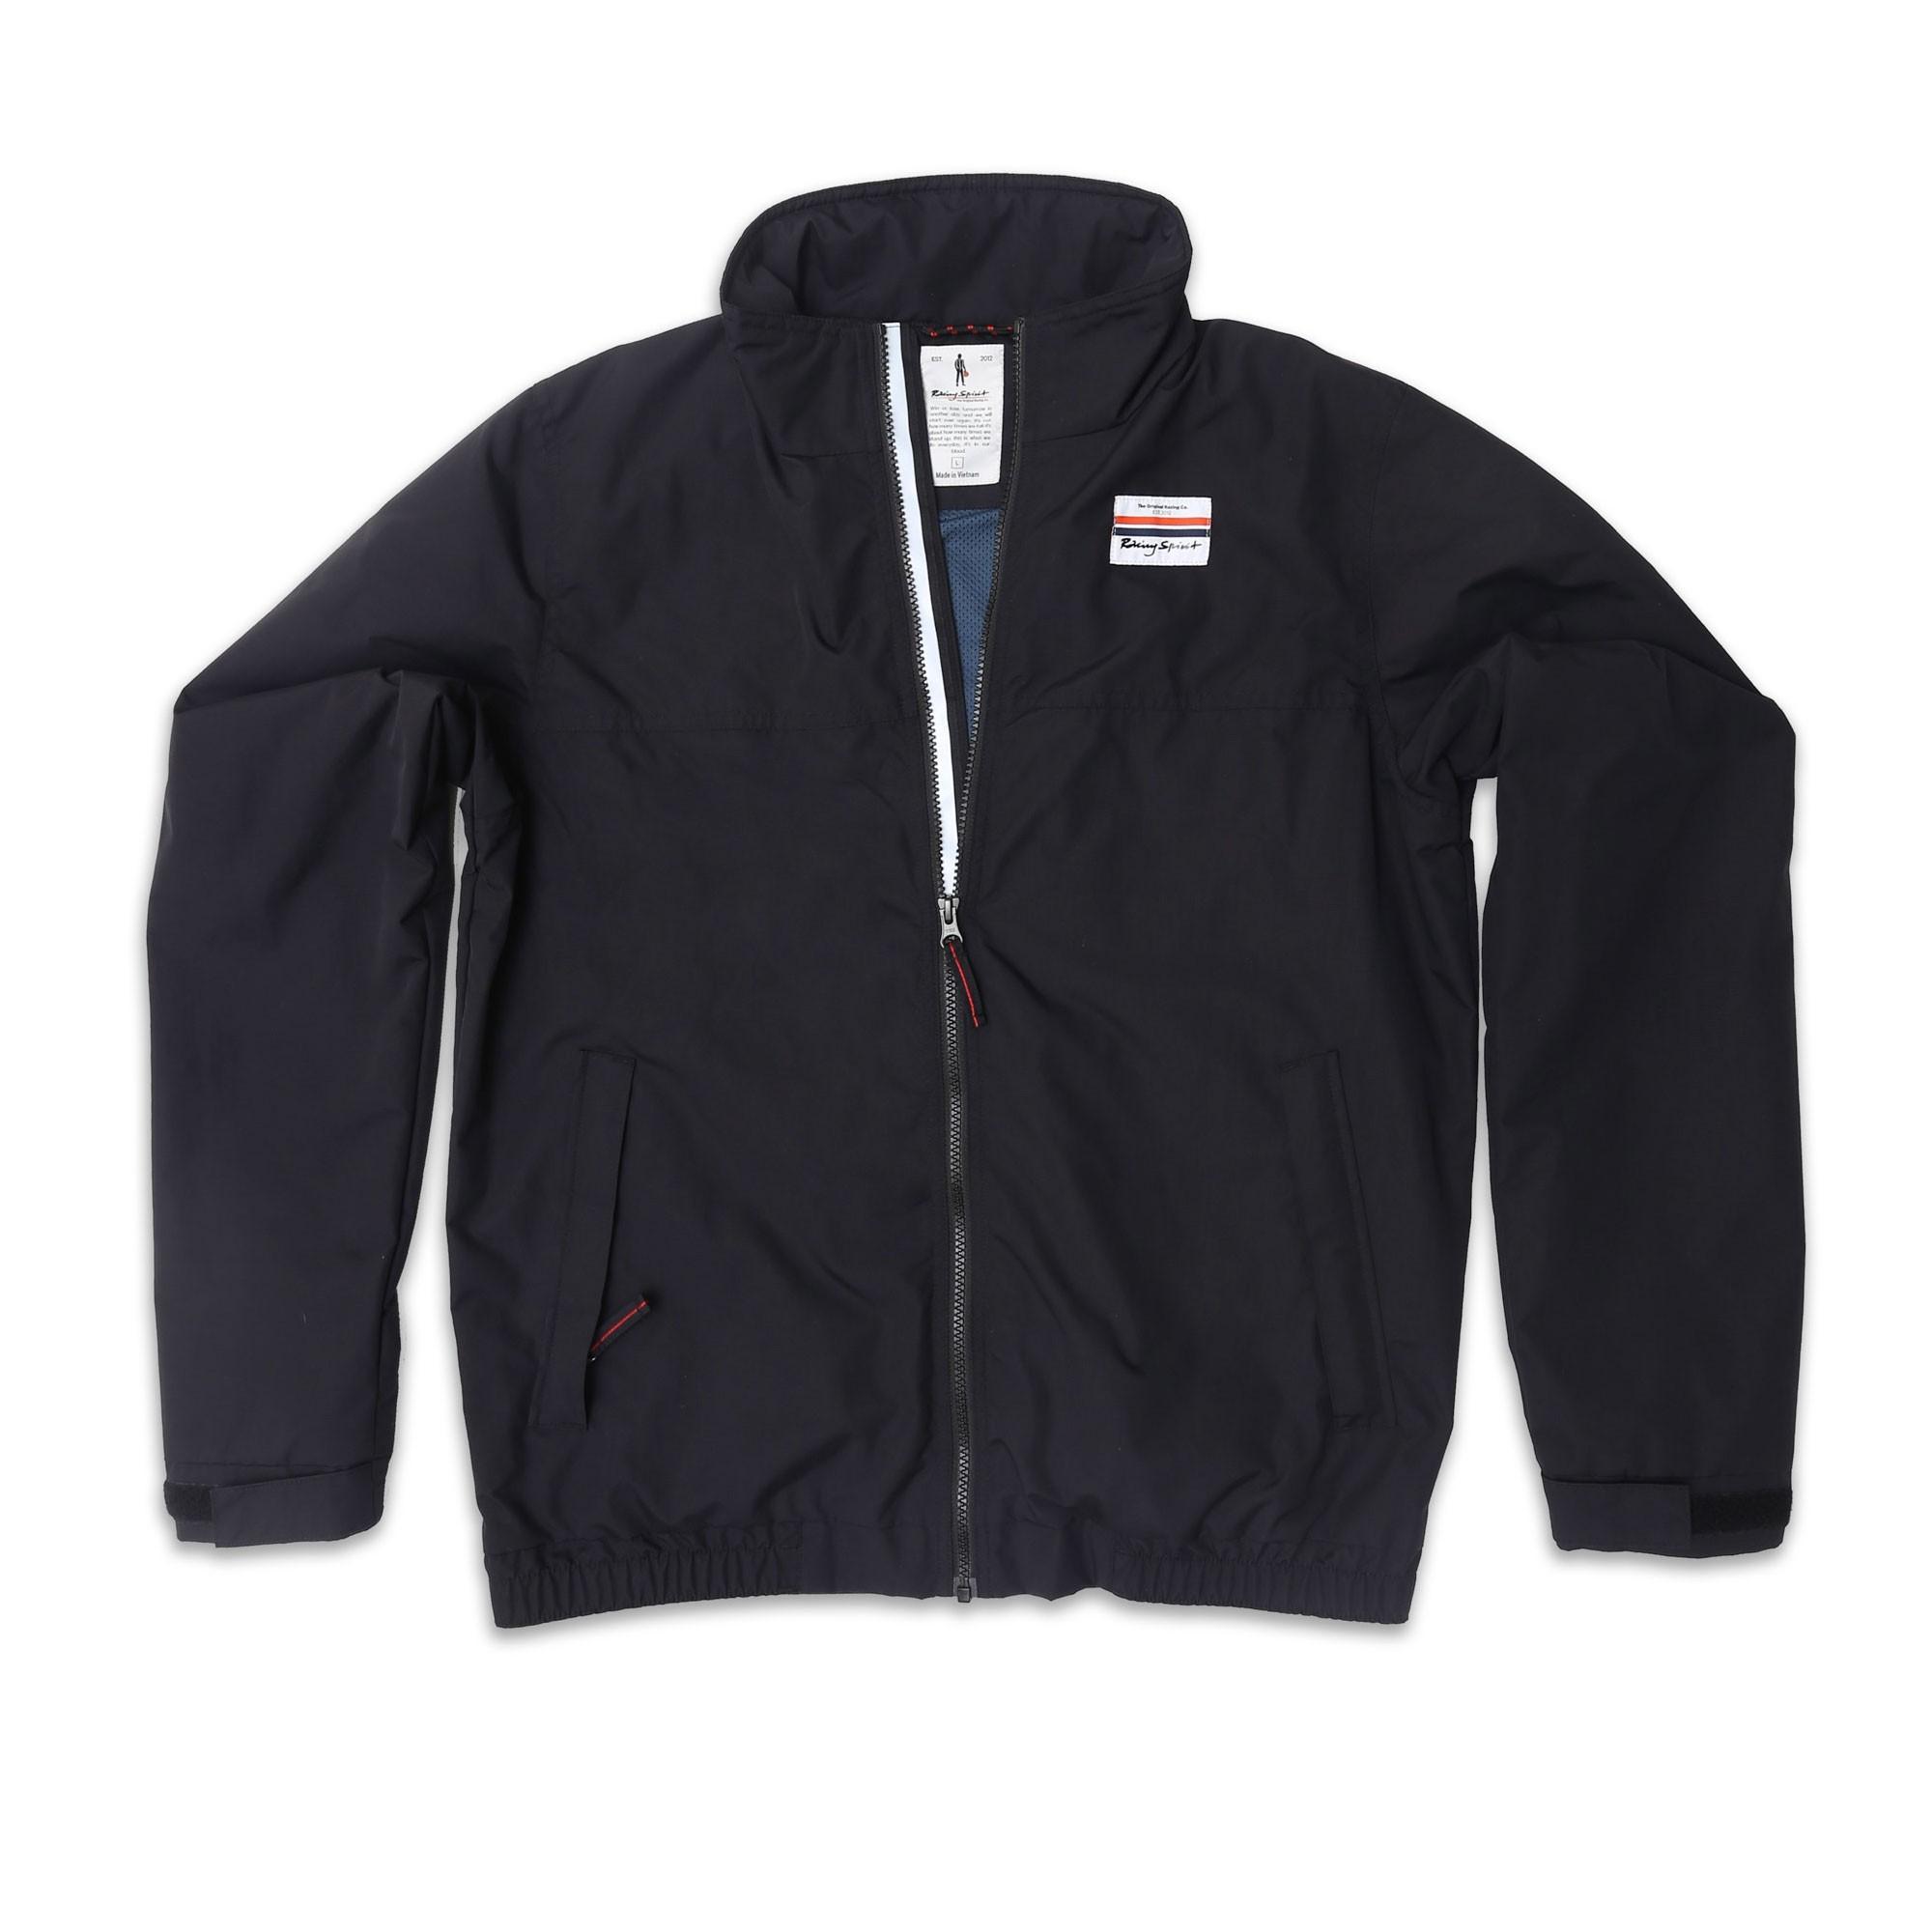 Omp Racing, Inc. Rain Jacket Racing Spirit Black M